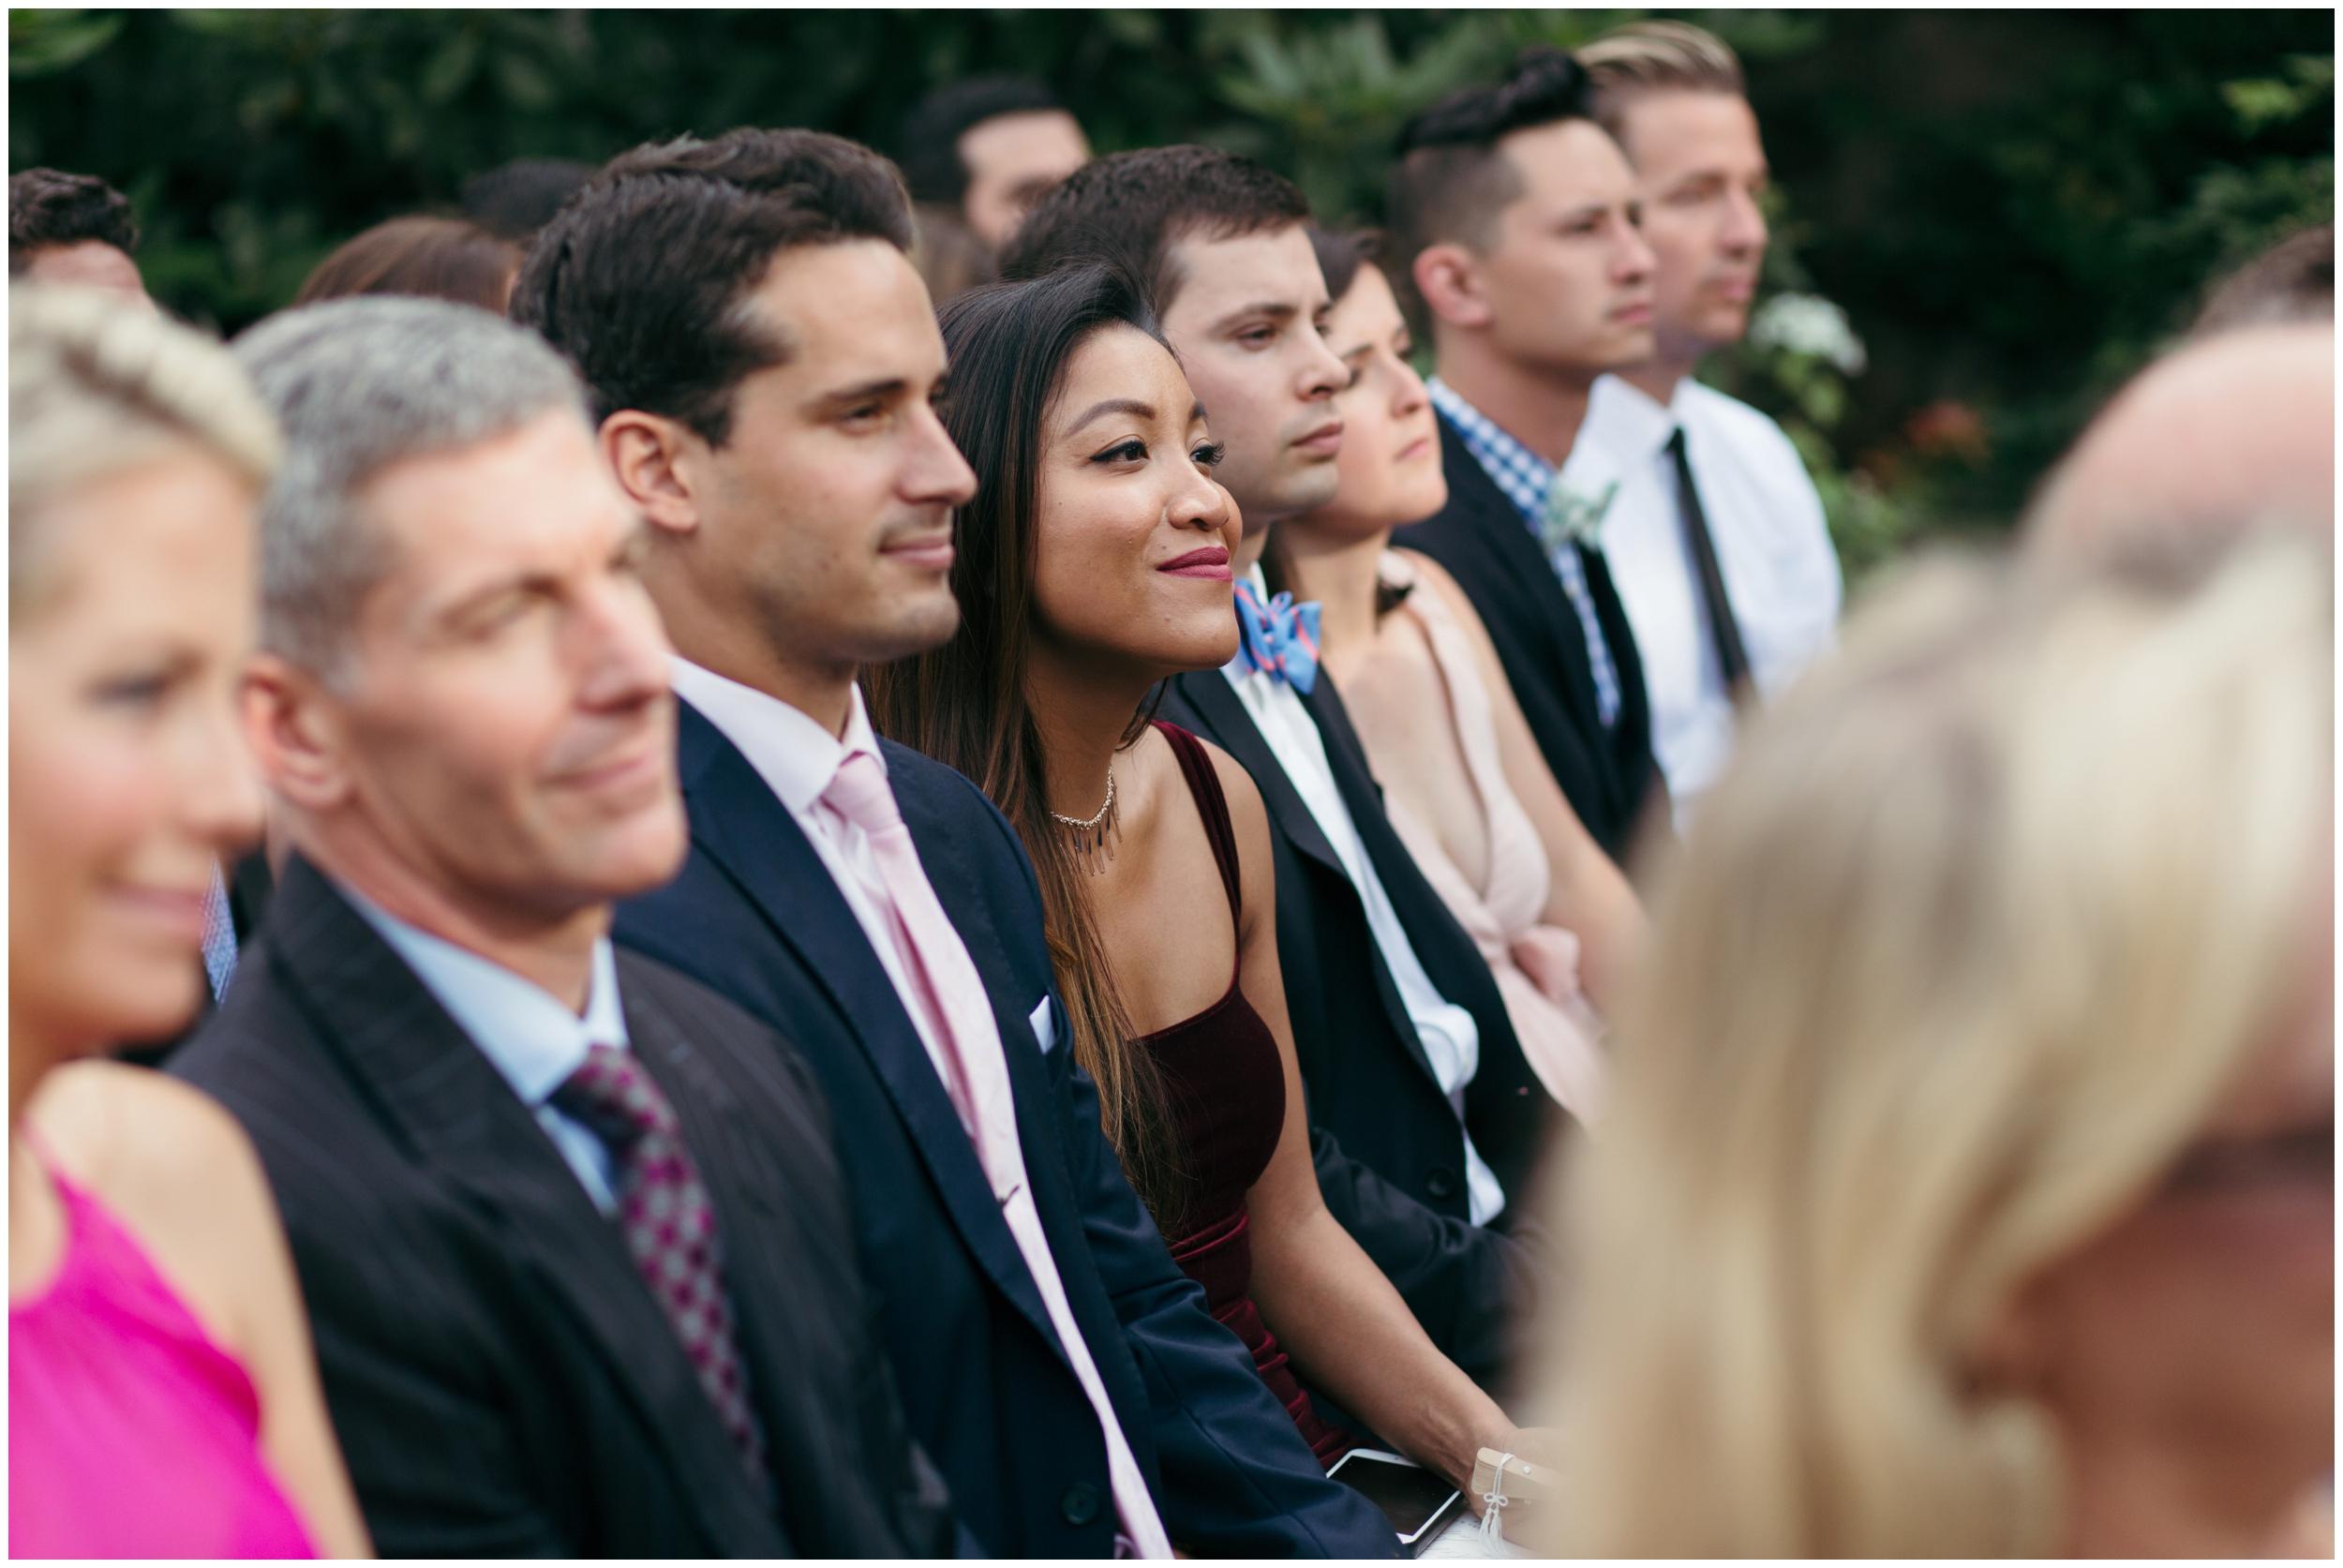 Willowdale-Estate-Wedding-Bailey-Q-Photo-Boston-Wedding-Photographer-042.JPG